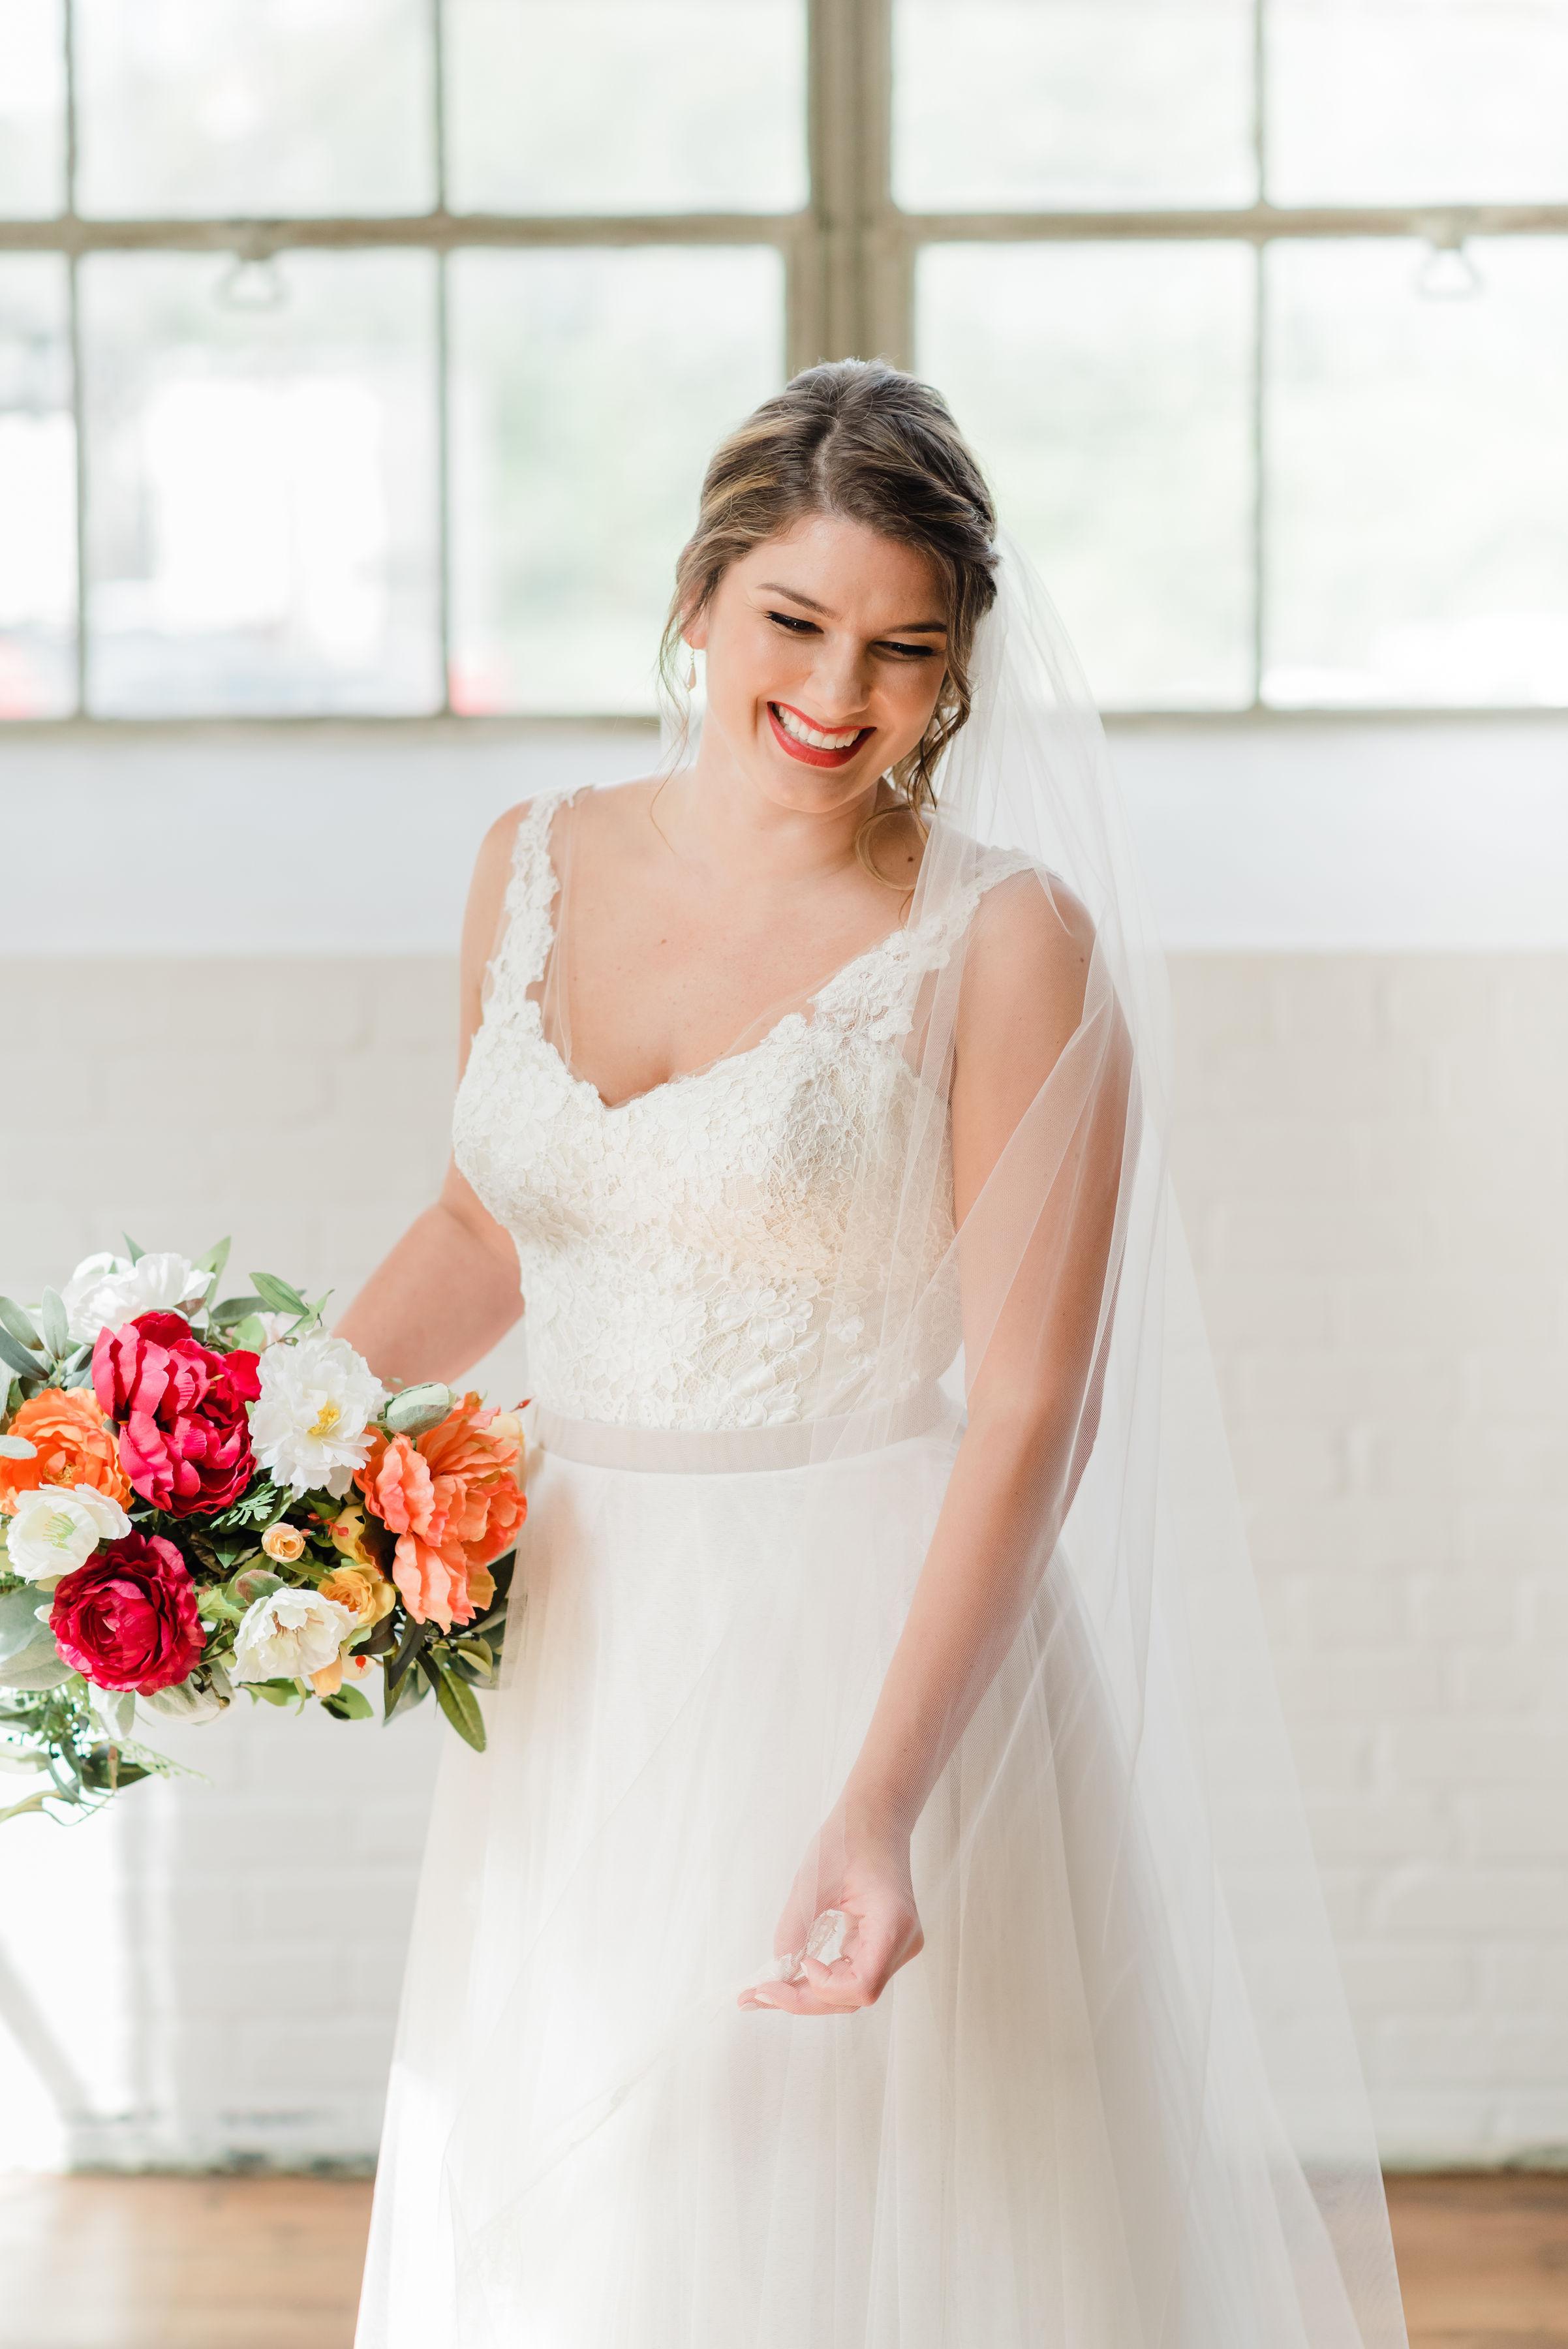 TaylorAdams_bridals-80.jpg